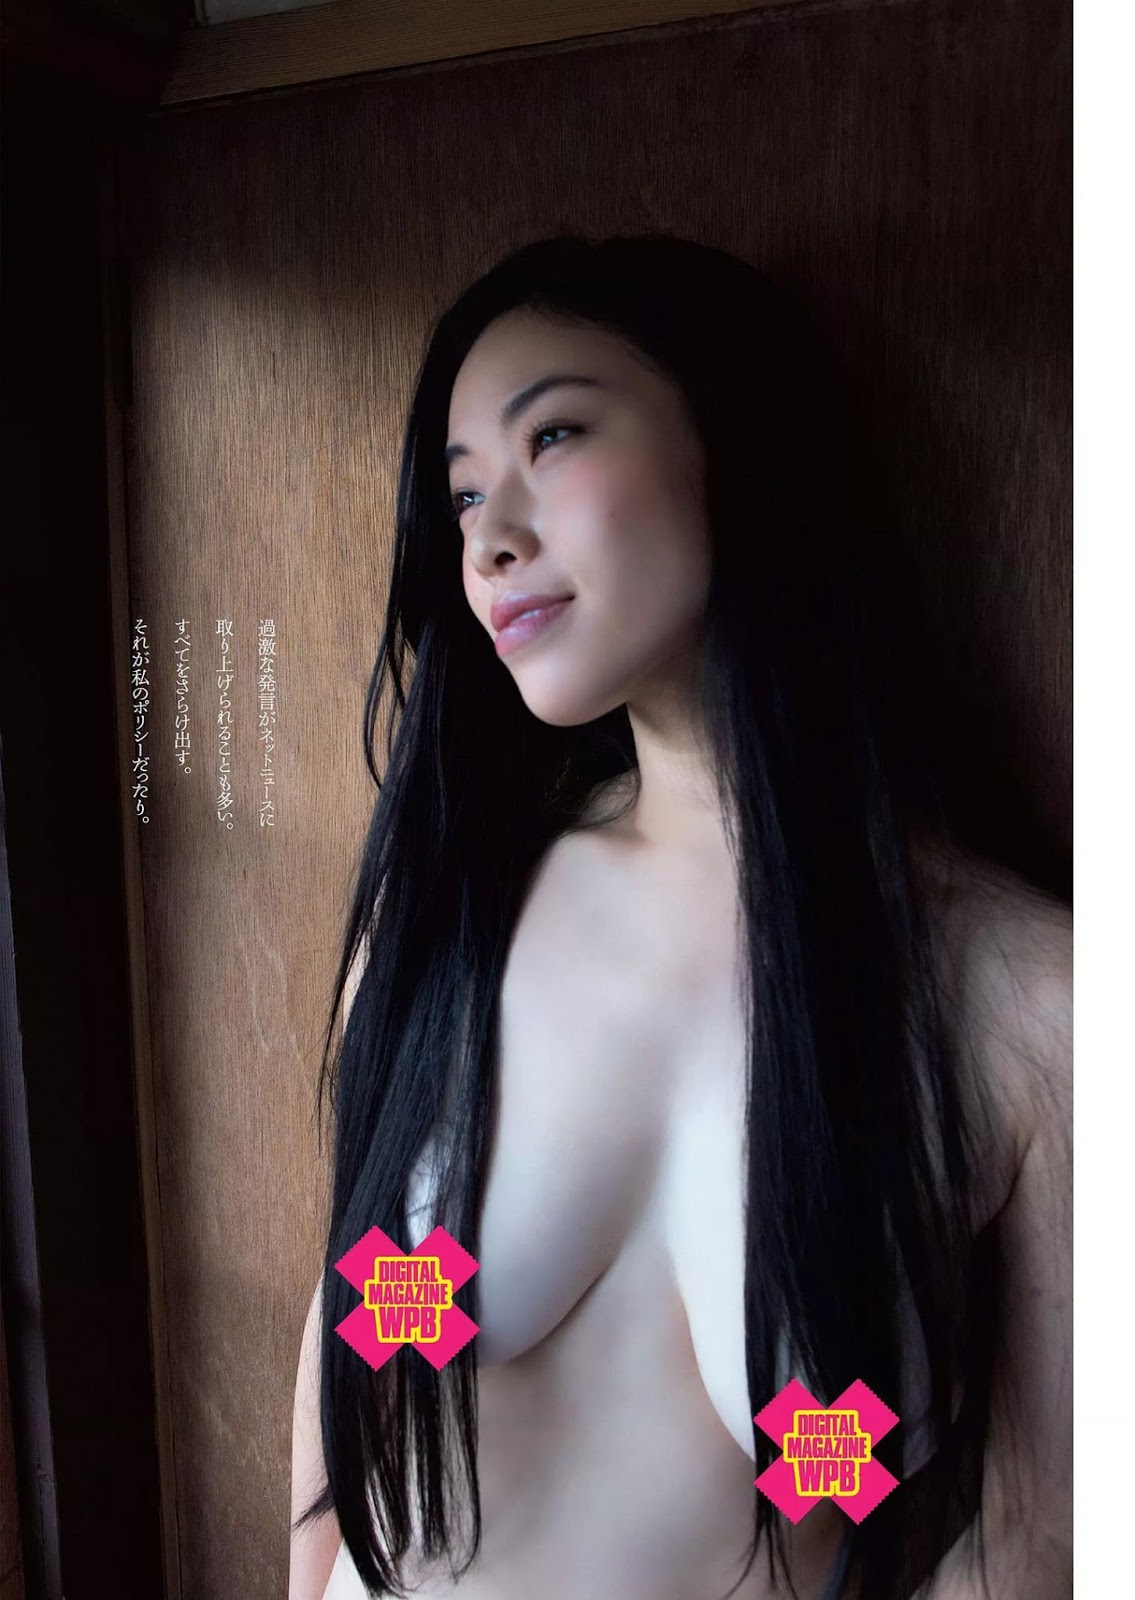 image http://scanlover.com/assets/images/8336-AKfX0nMuphH3pkGC.jpeg